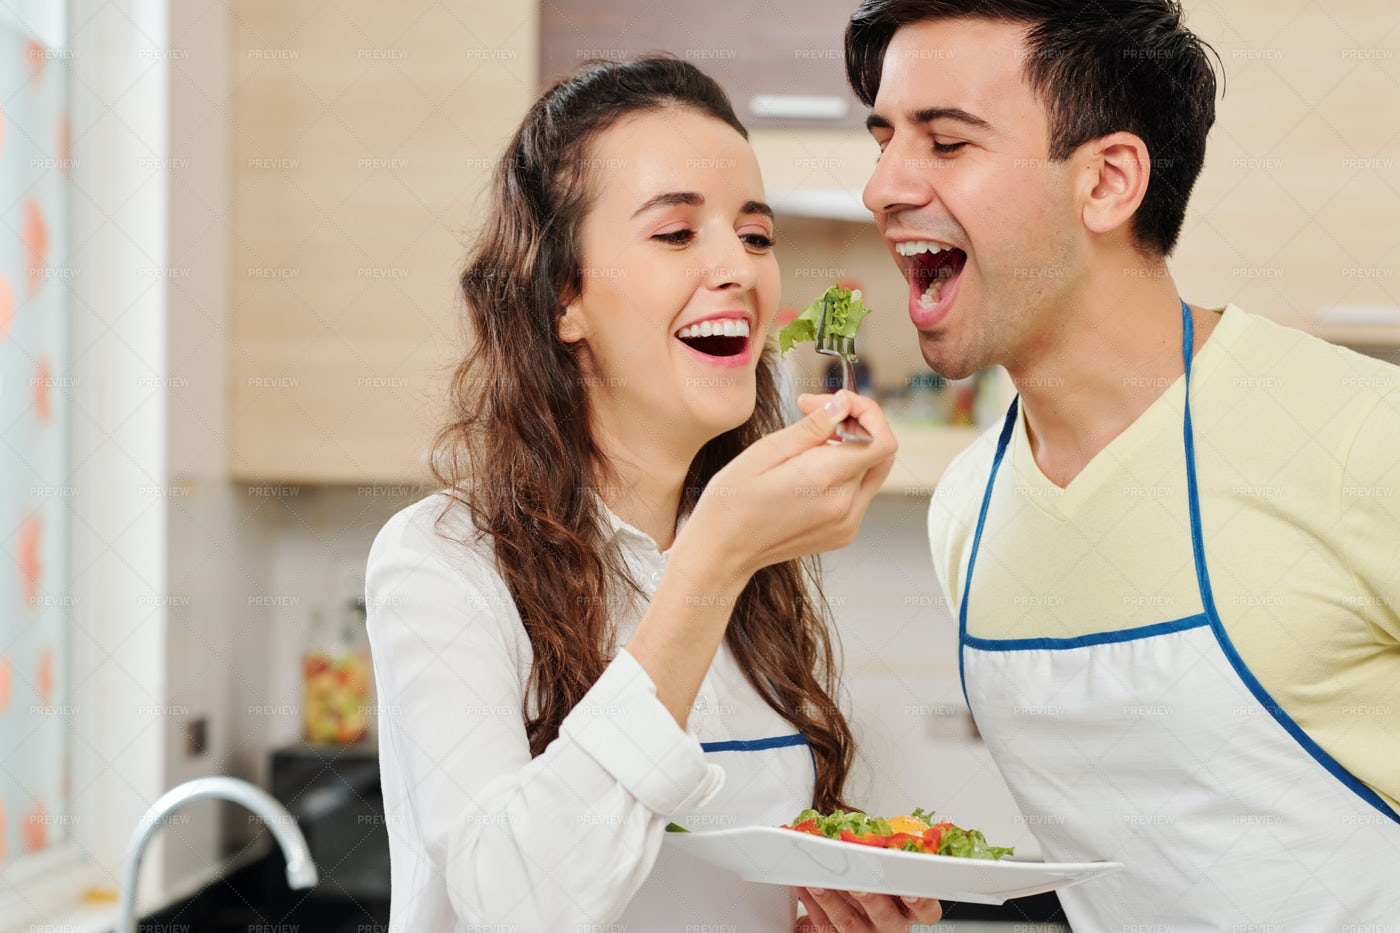 Cheerful Woman Feeding Husband: Stock Photos